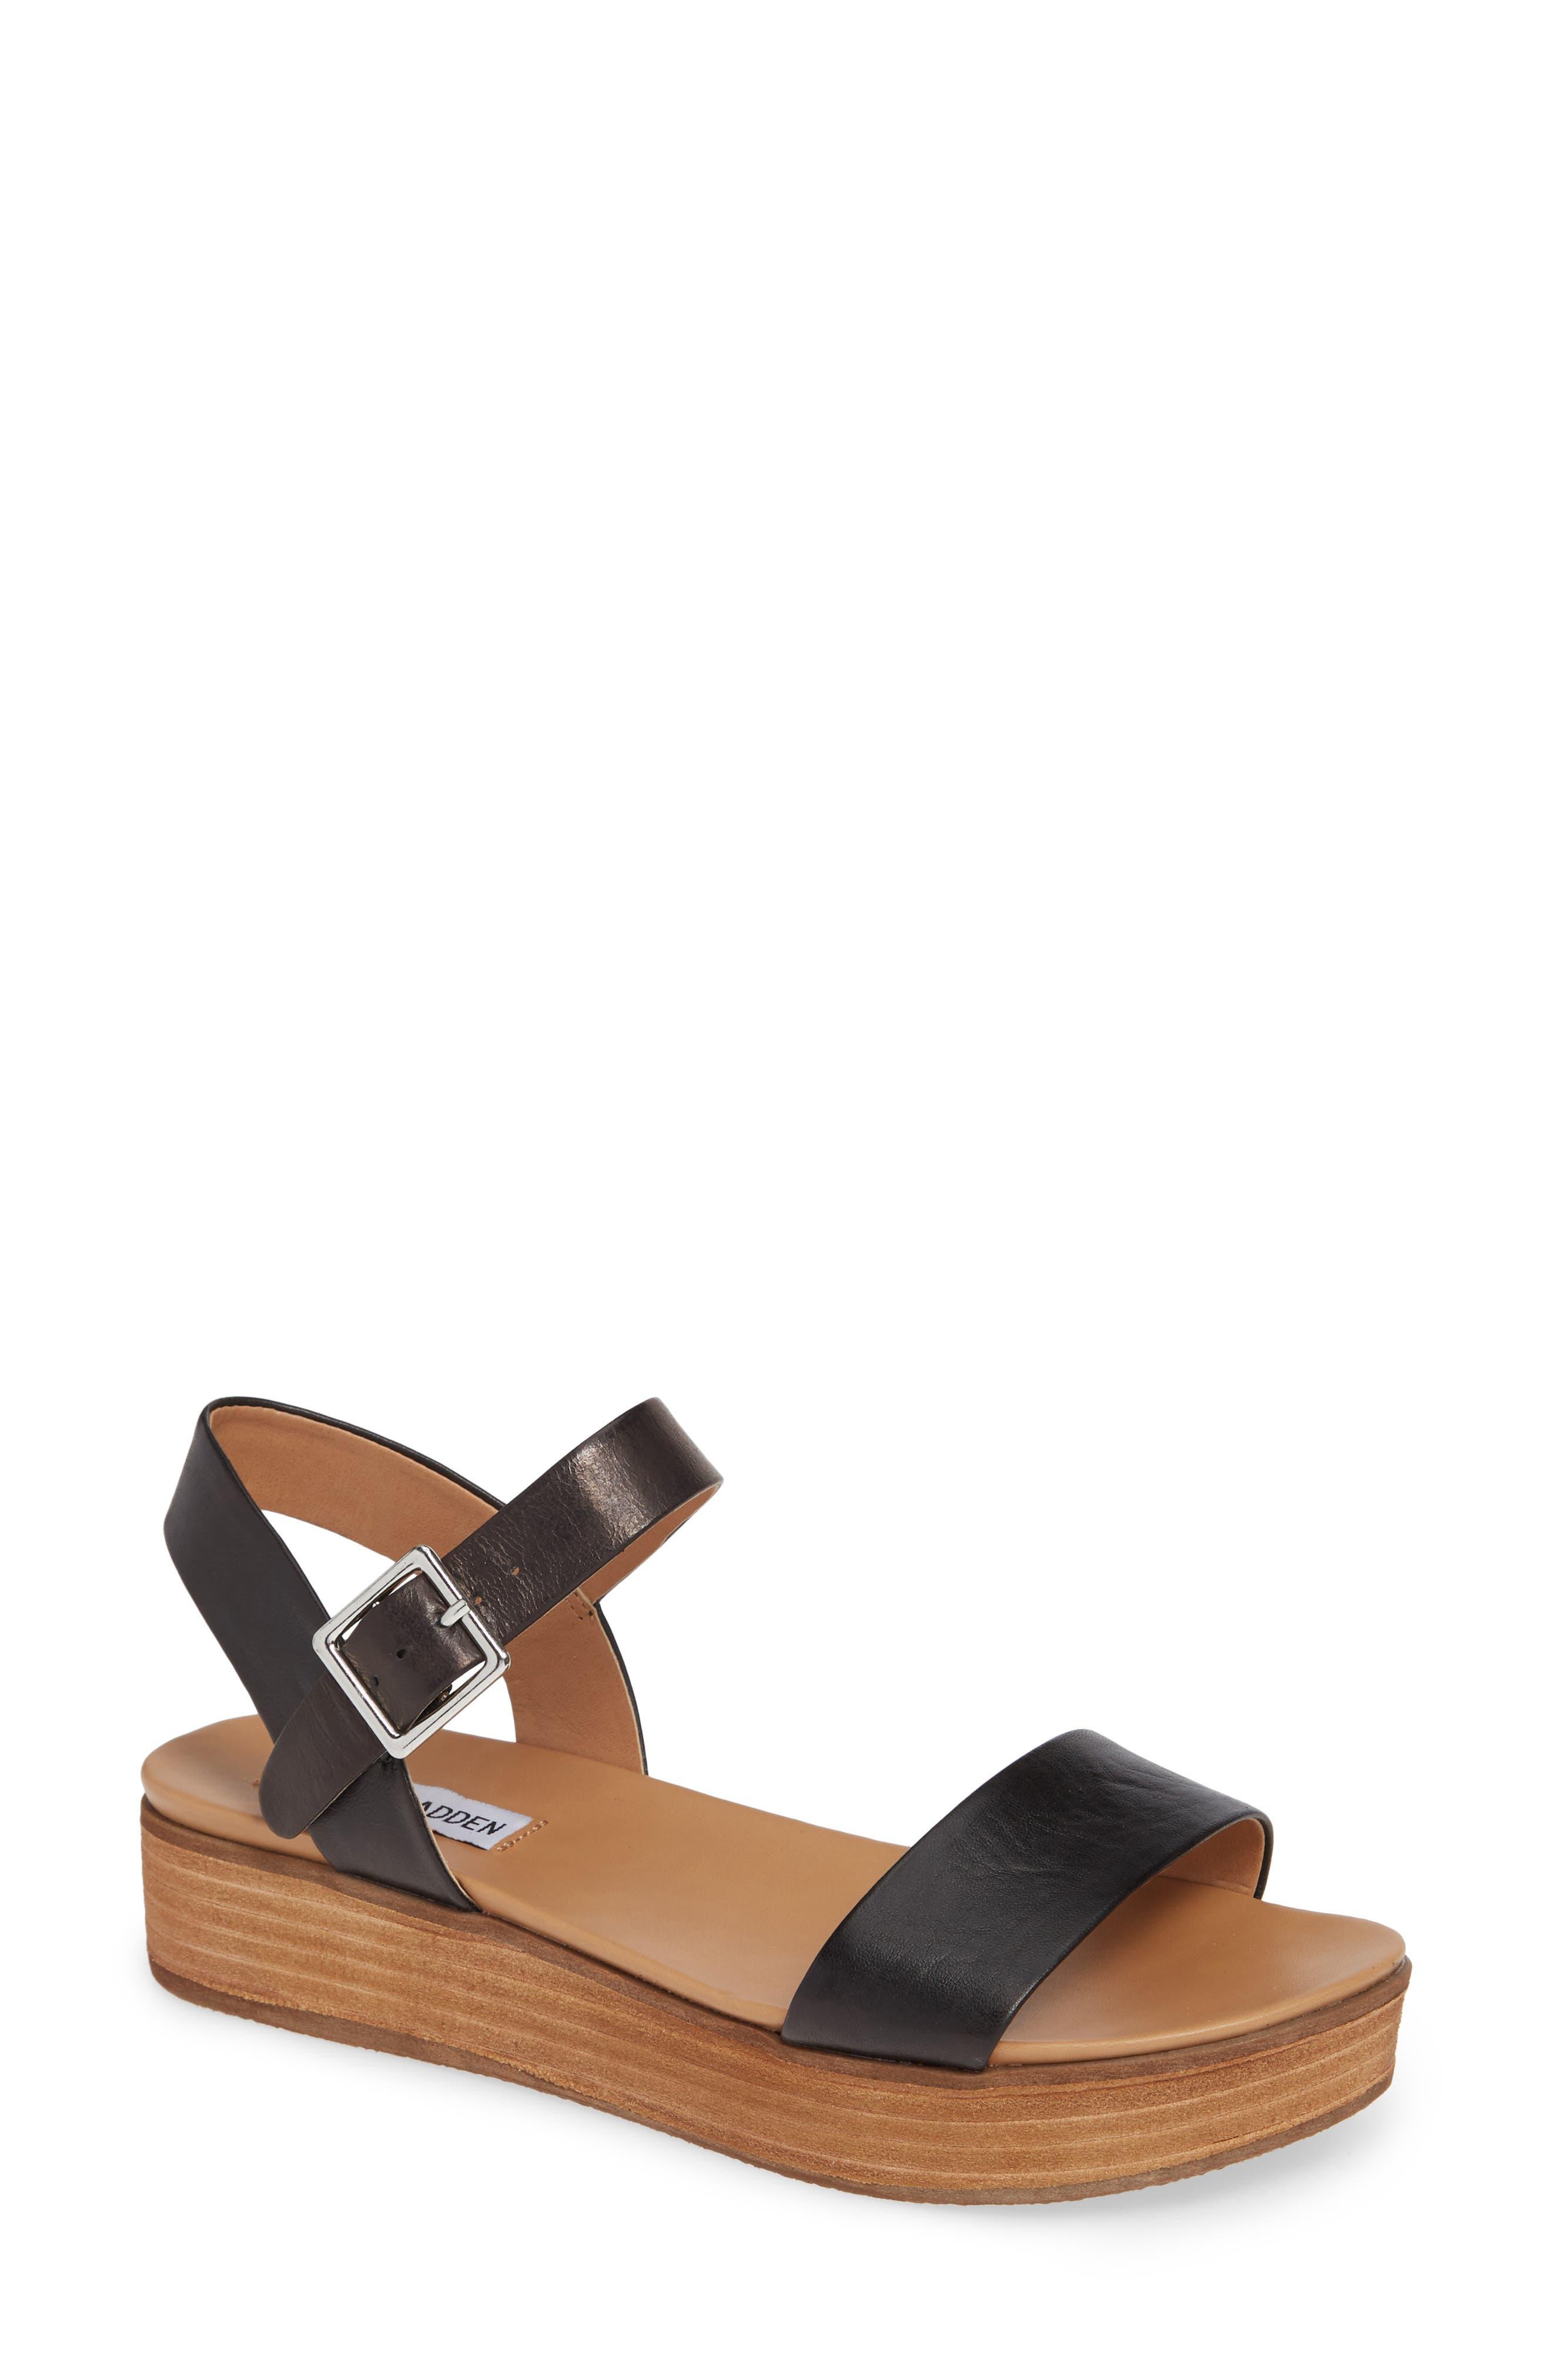 STEVE MADDEN, Aida Platform Sandal, Main thumbnail 1, color, BLACK LEATHER